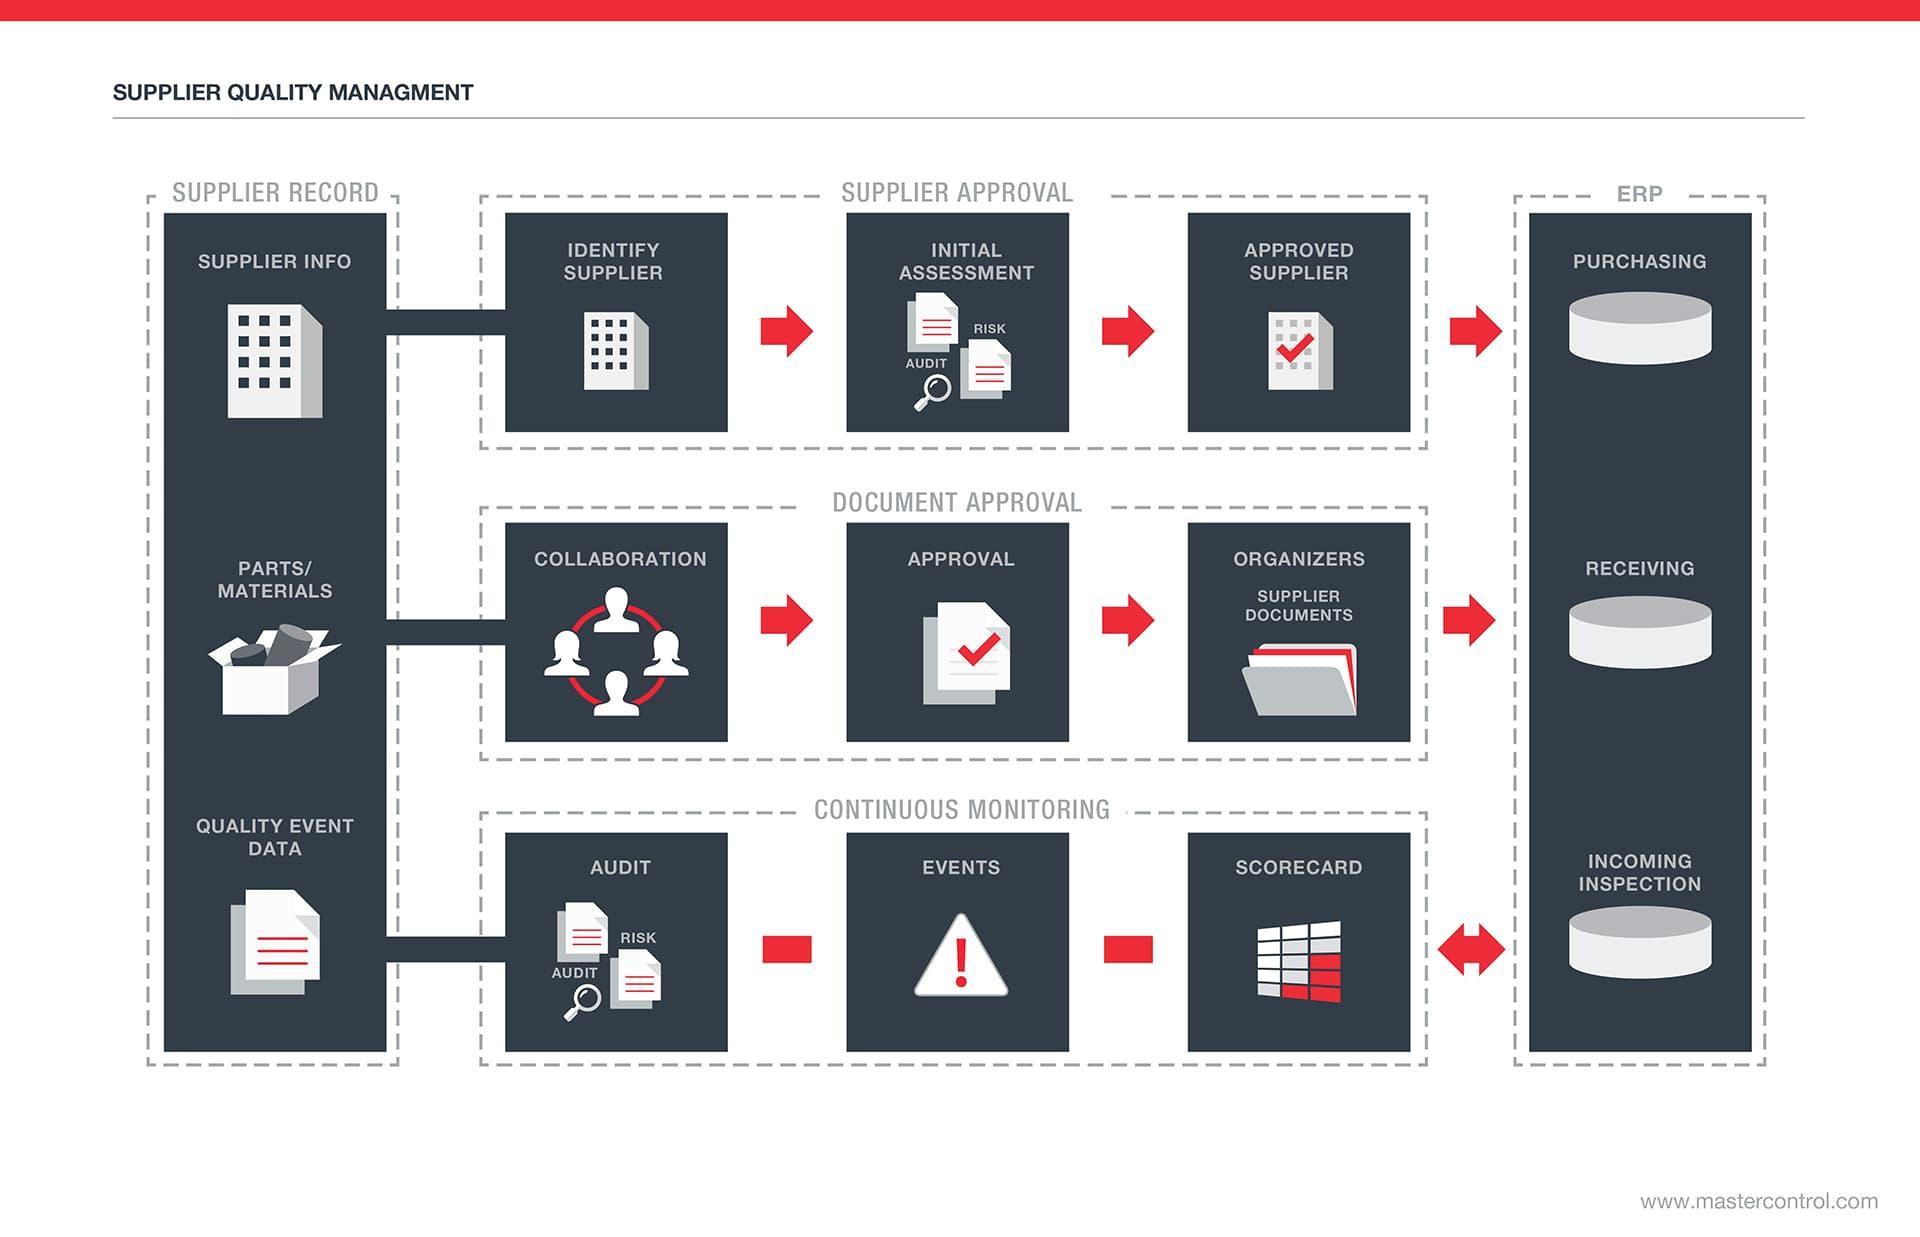 supplier rating and relationship diagram program